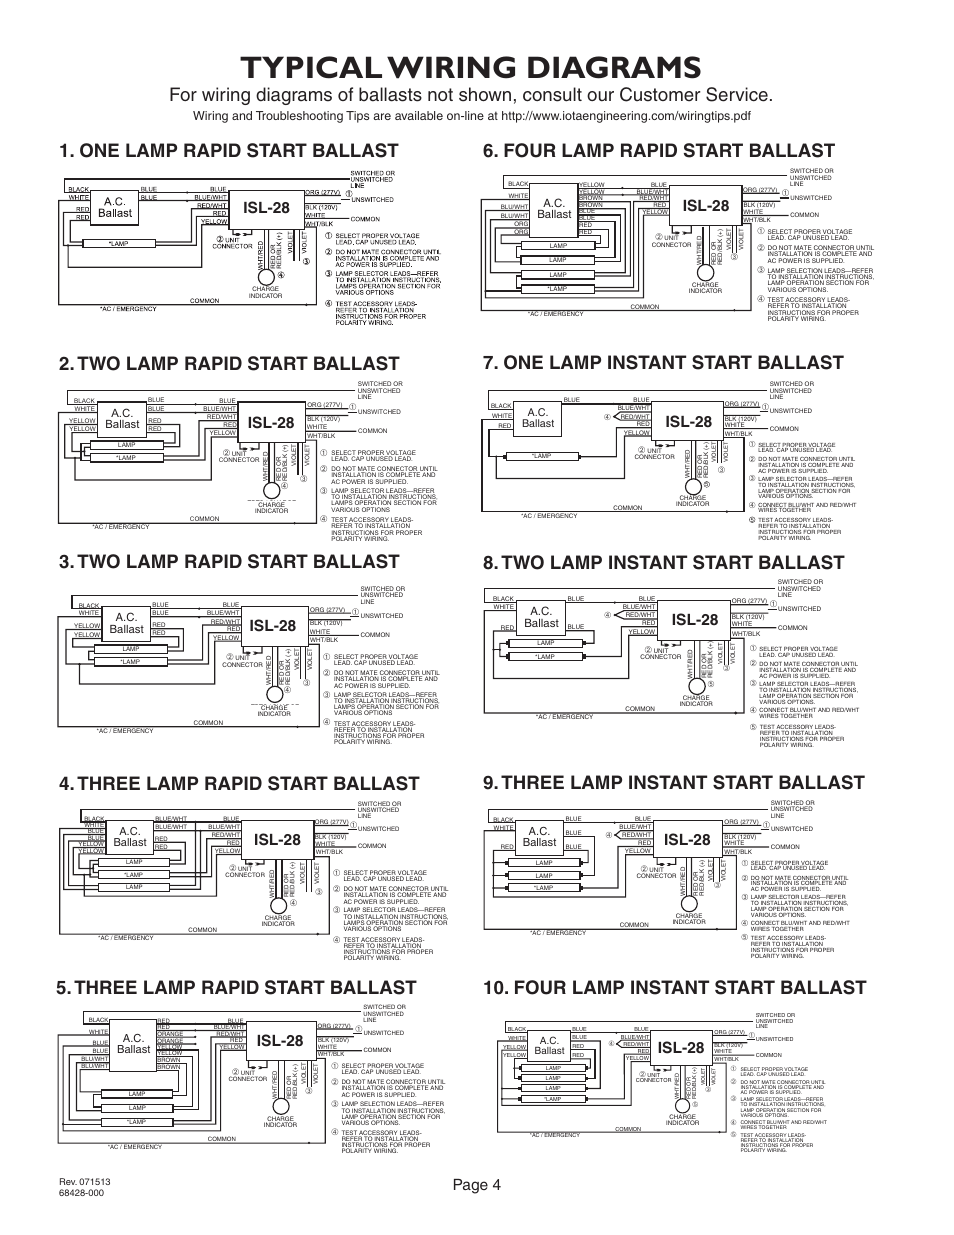 iota isl 28 page4?resize\\\\\\\\\\\\\\\\\\\\\\\\\\\\\\\=665%2C861 electric motors wiring schematic ks63bxmc 1820 craftsman,motors  at creativeand.co